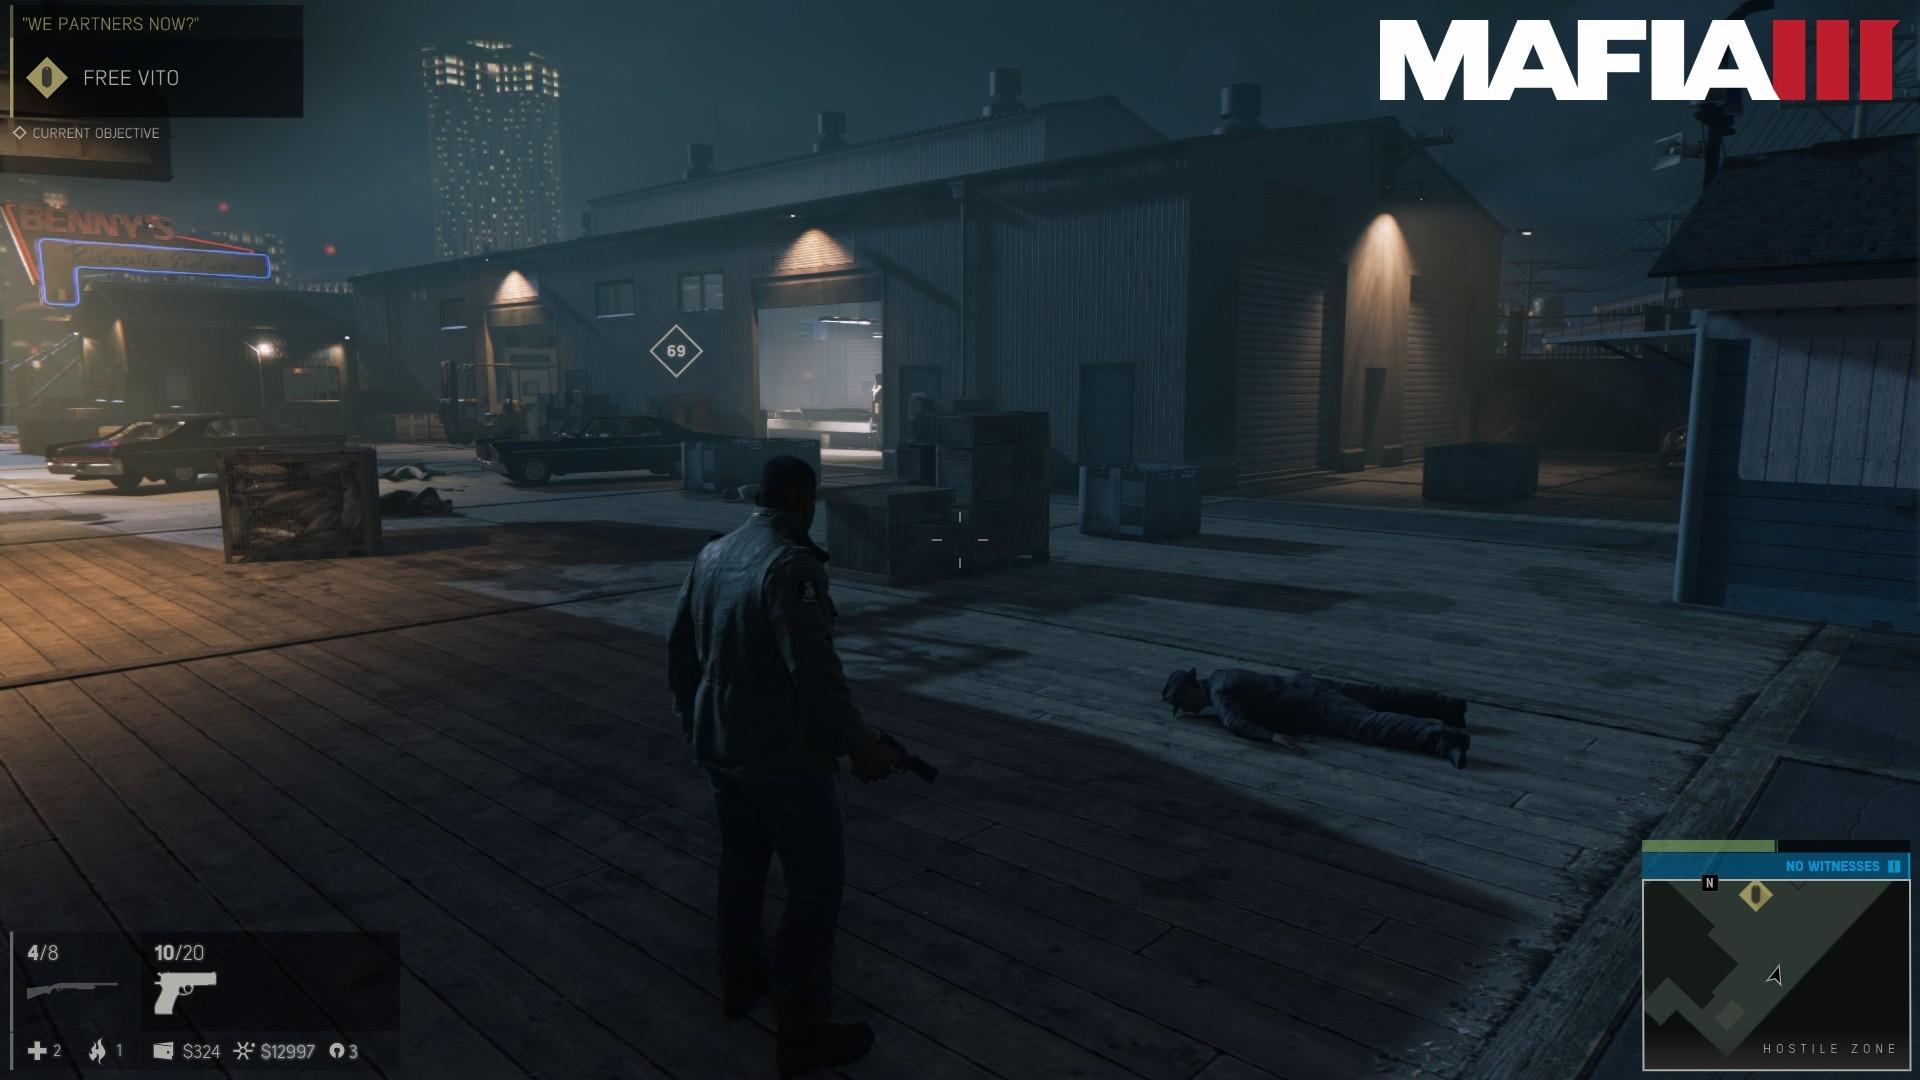 Miro Kolarik - MAFIA 3 - Buildings - Vito's safehouse